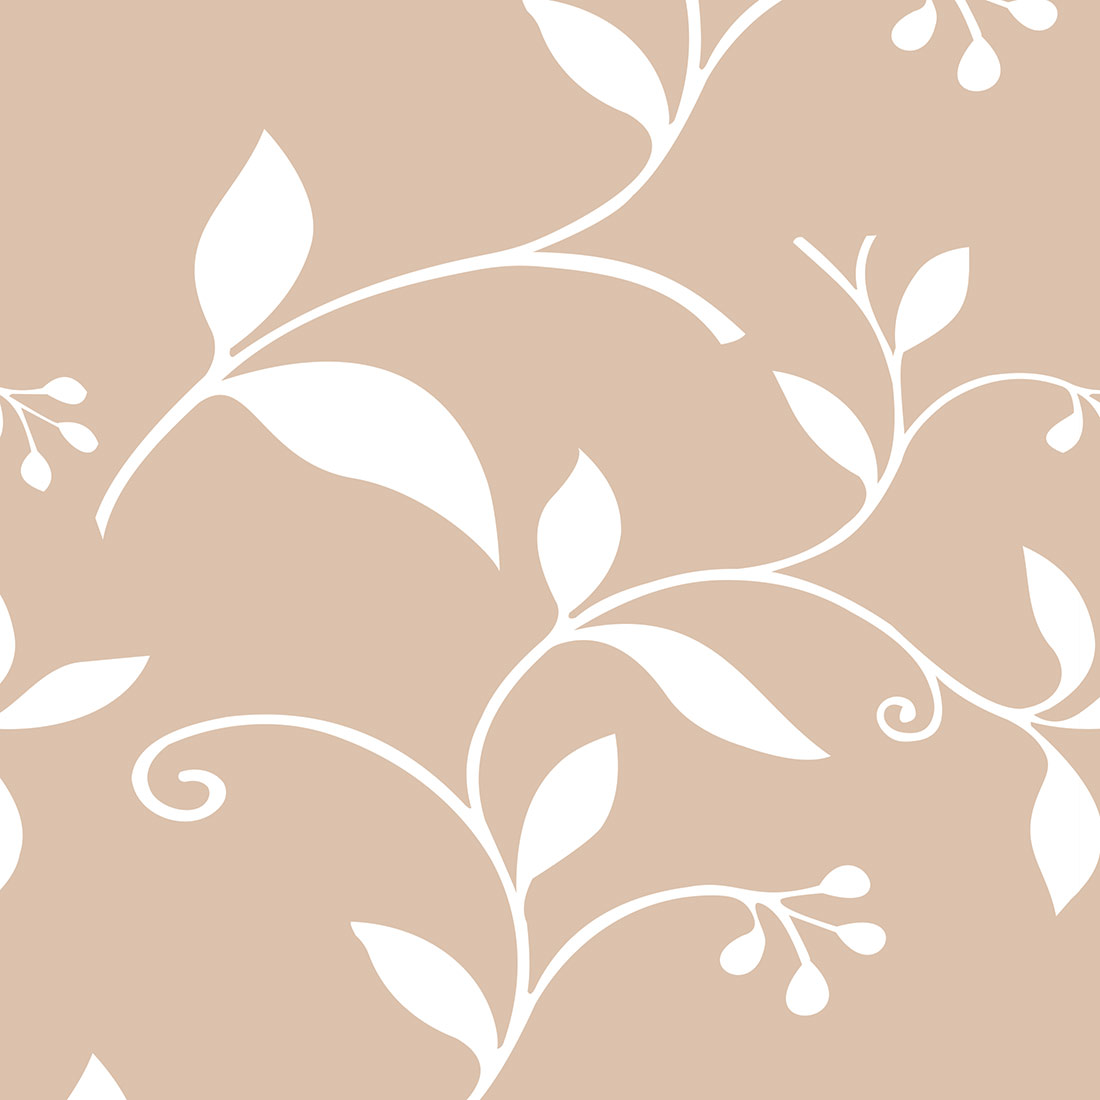 Papel de Parede Floral Folhagem Branco Fundo Nude